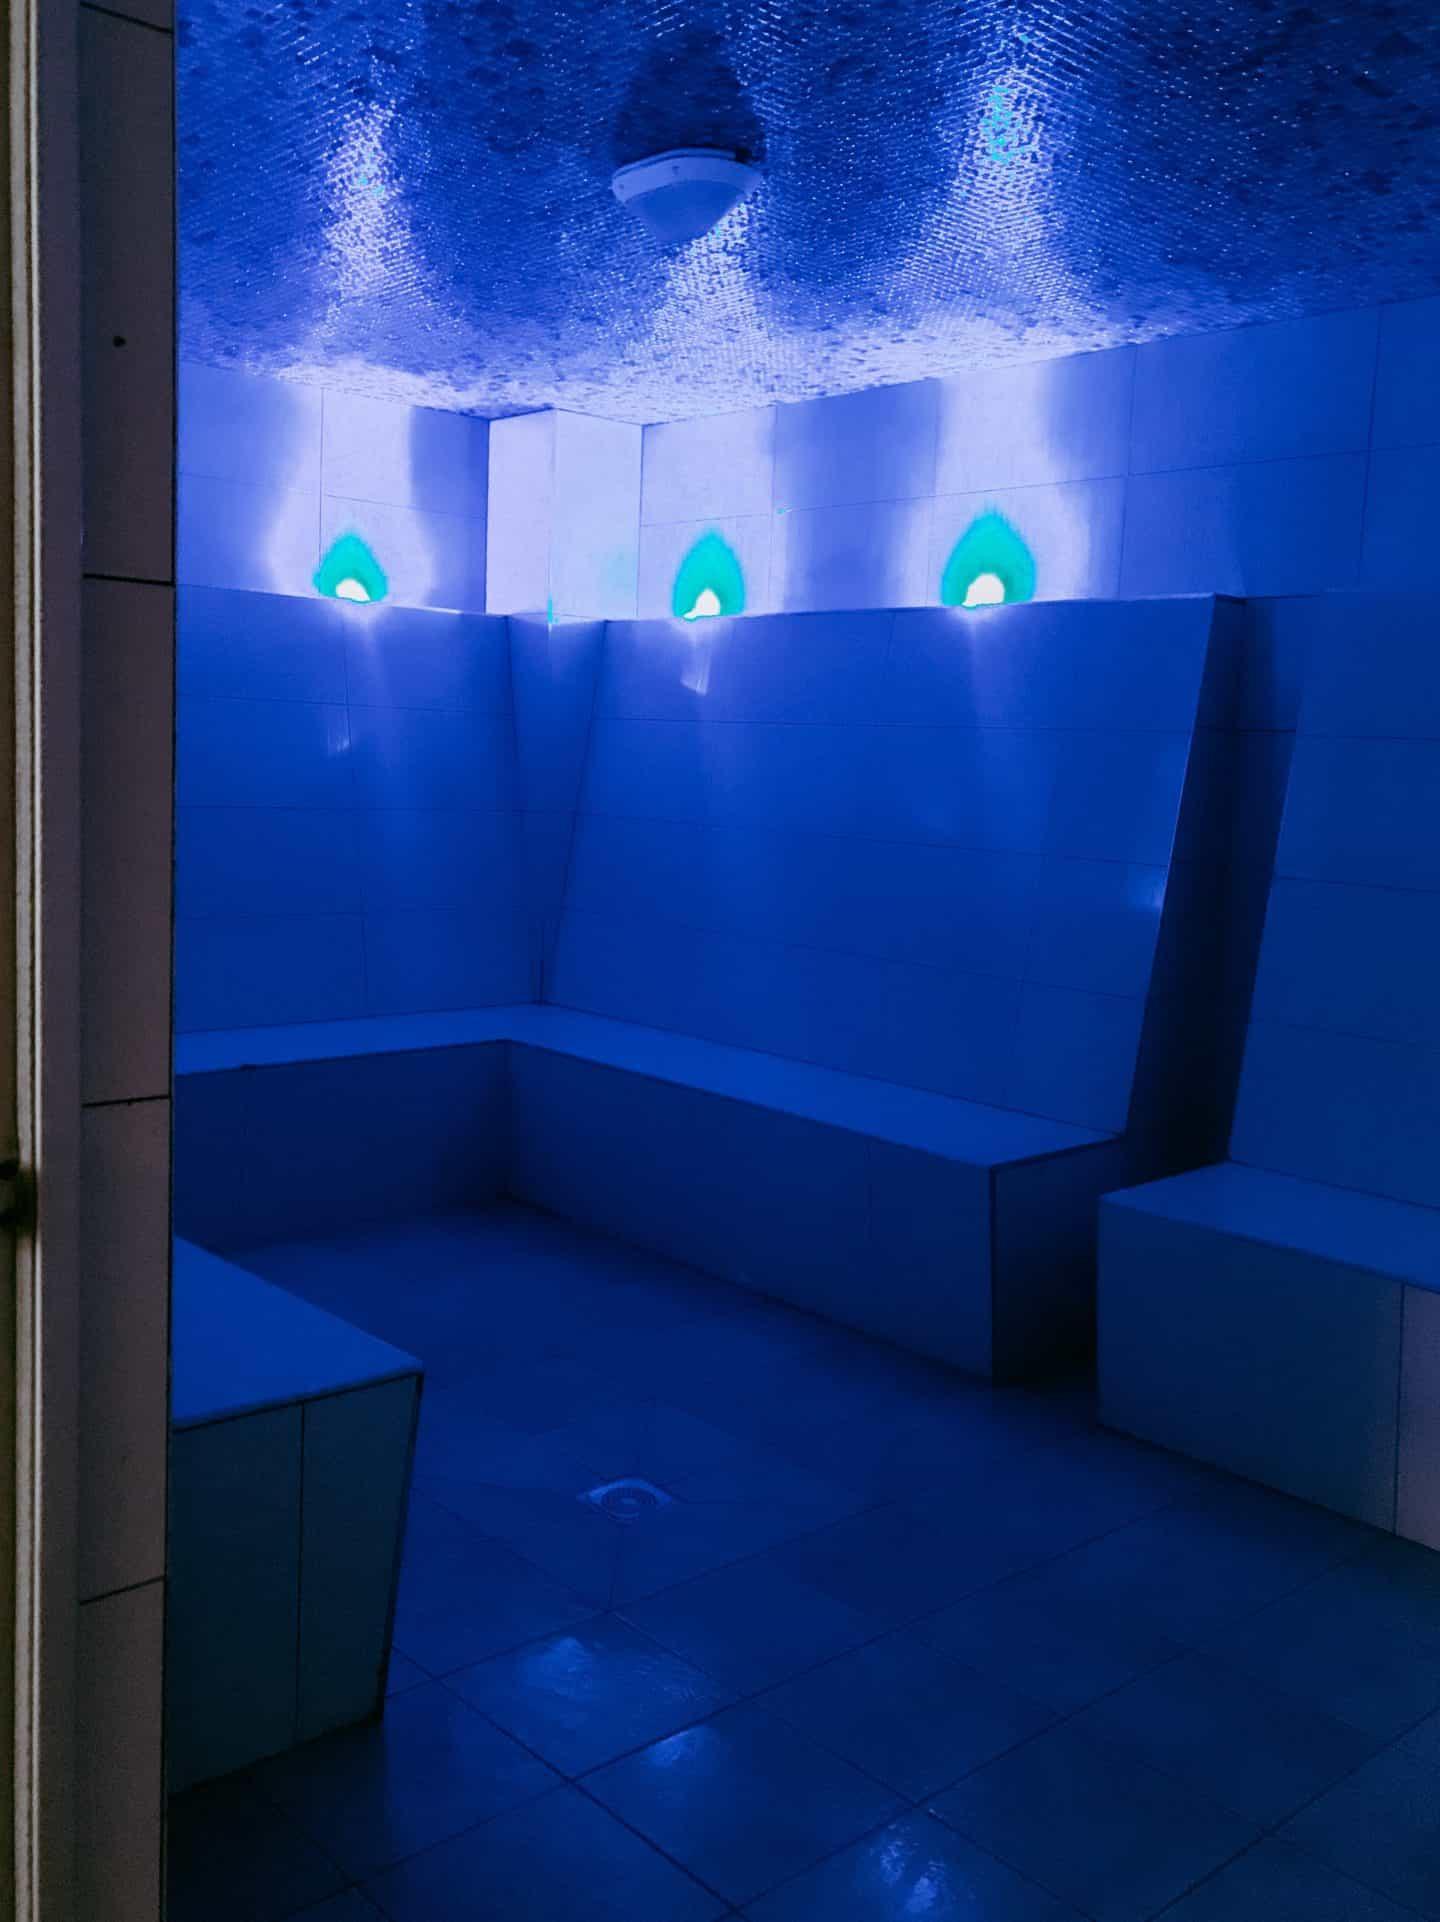 The steam room at David LLoyd Clubs, Milton Keynes